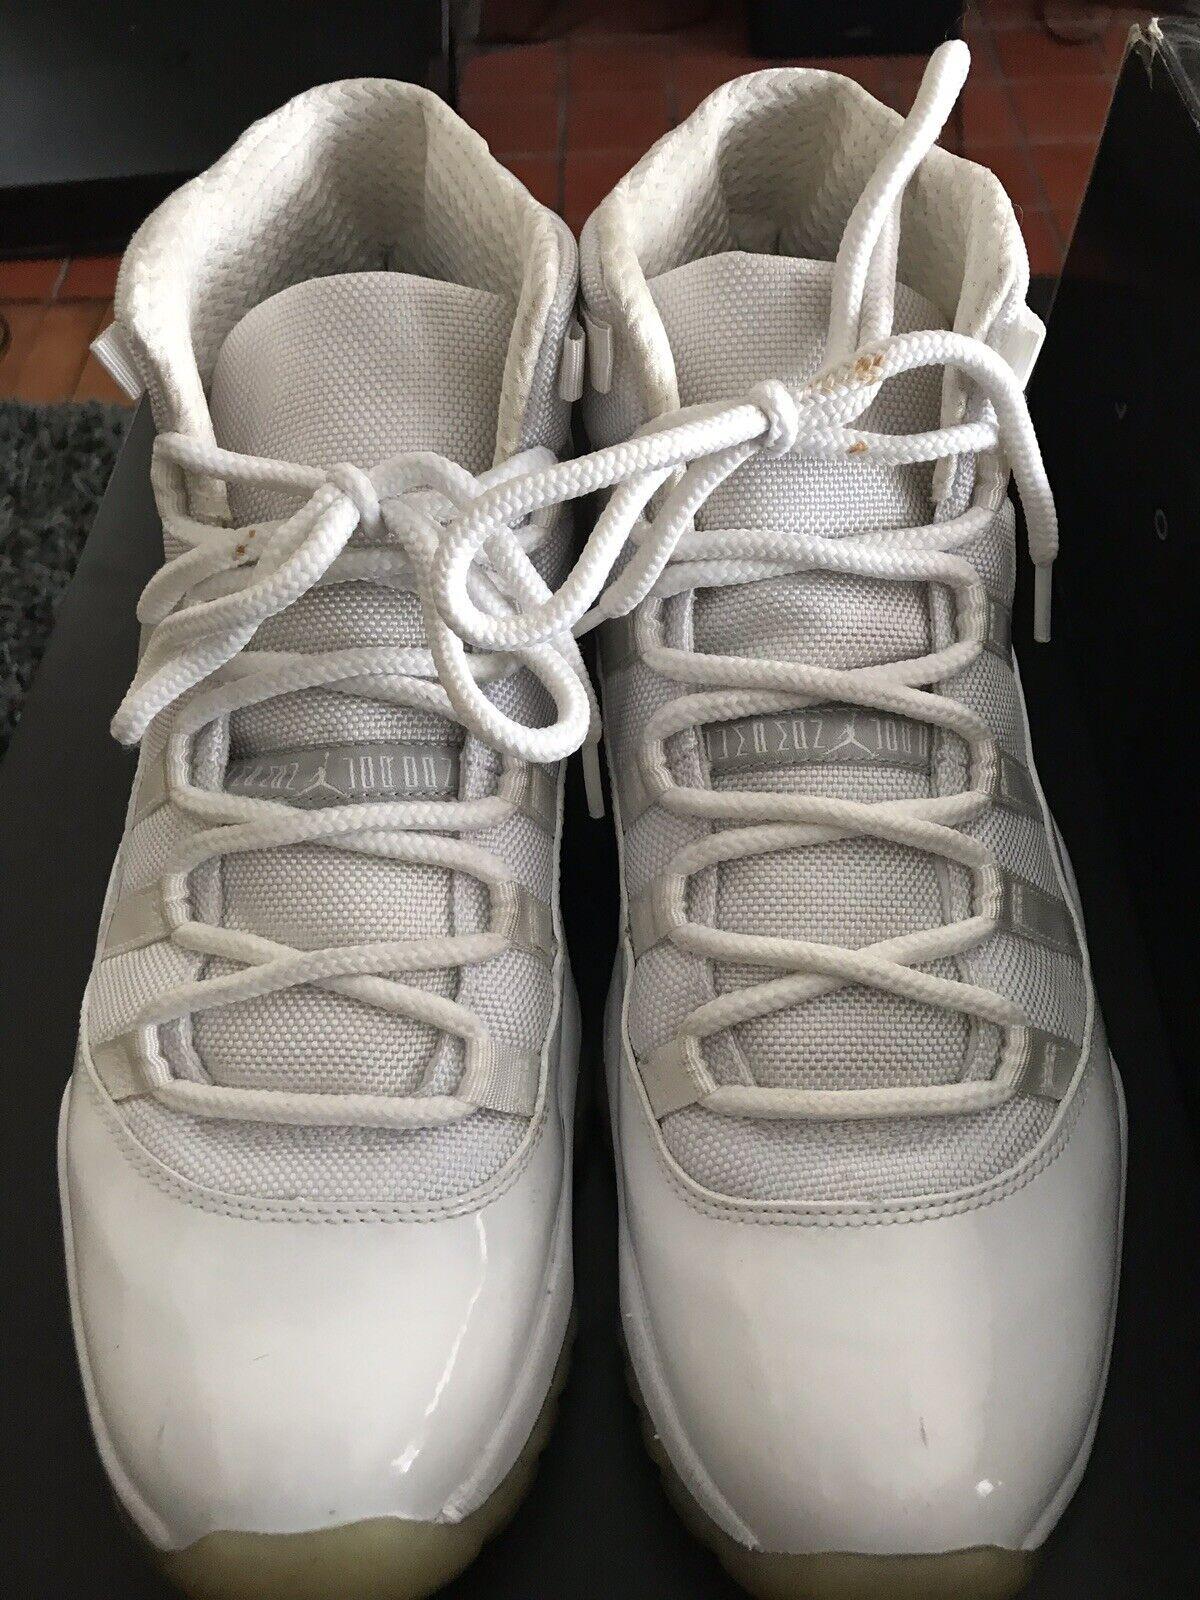 9abe1803c28148 Nike Air Jordan 11 XI Retro Silver Anniversary Anniversary Anniversary Size  12 2010 a5b961